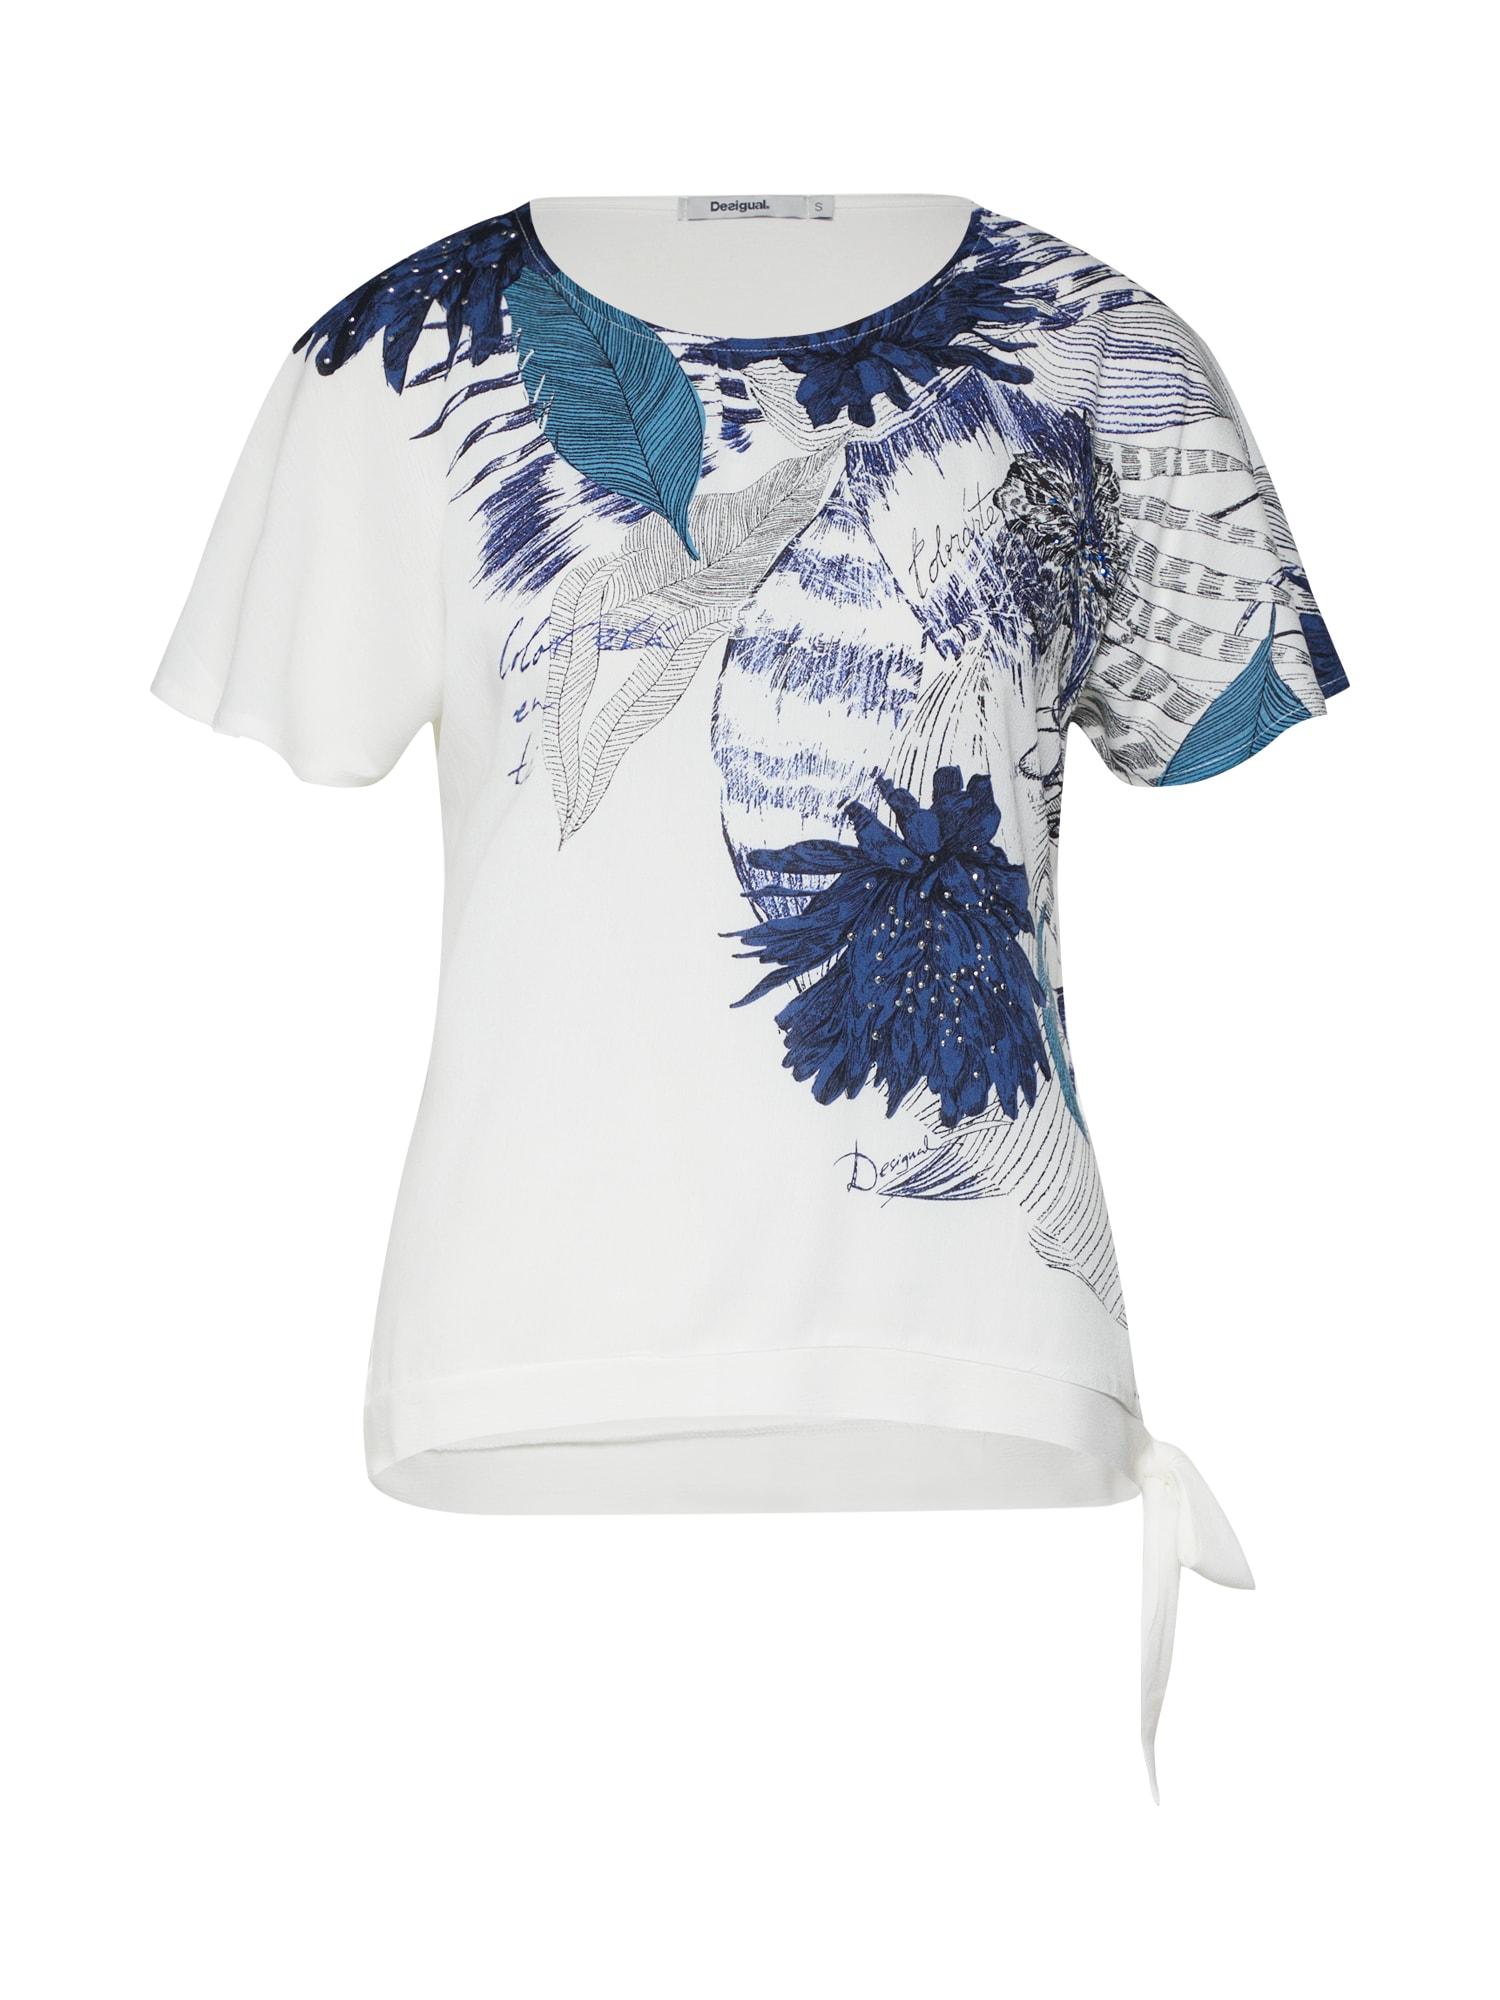 Tričko TS_WICHITAS modrá bílá Desigual